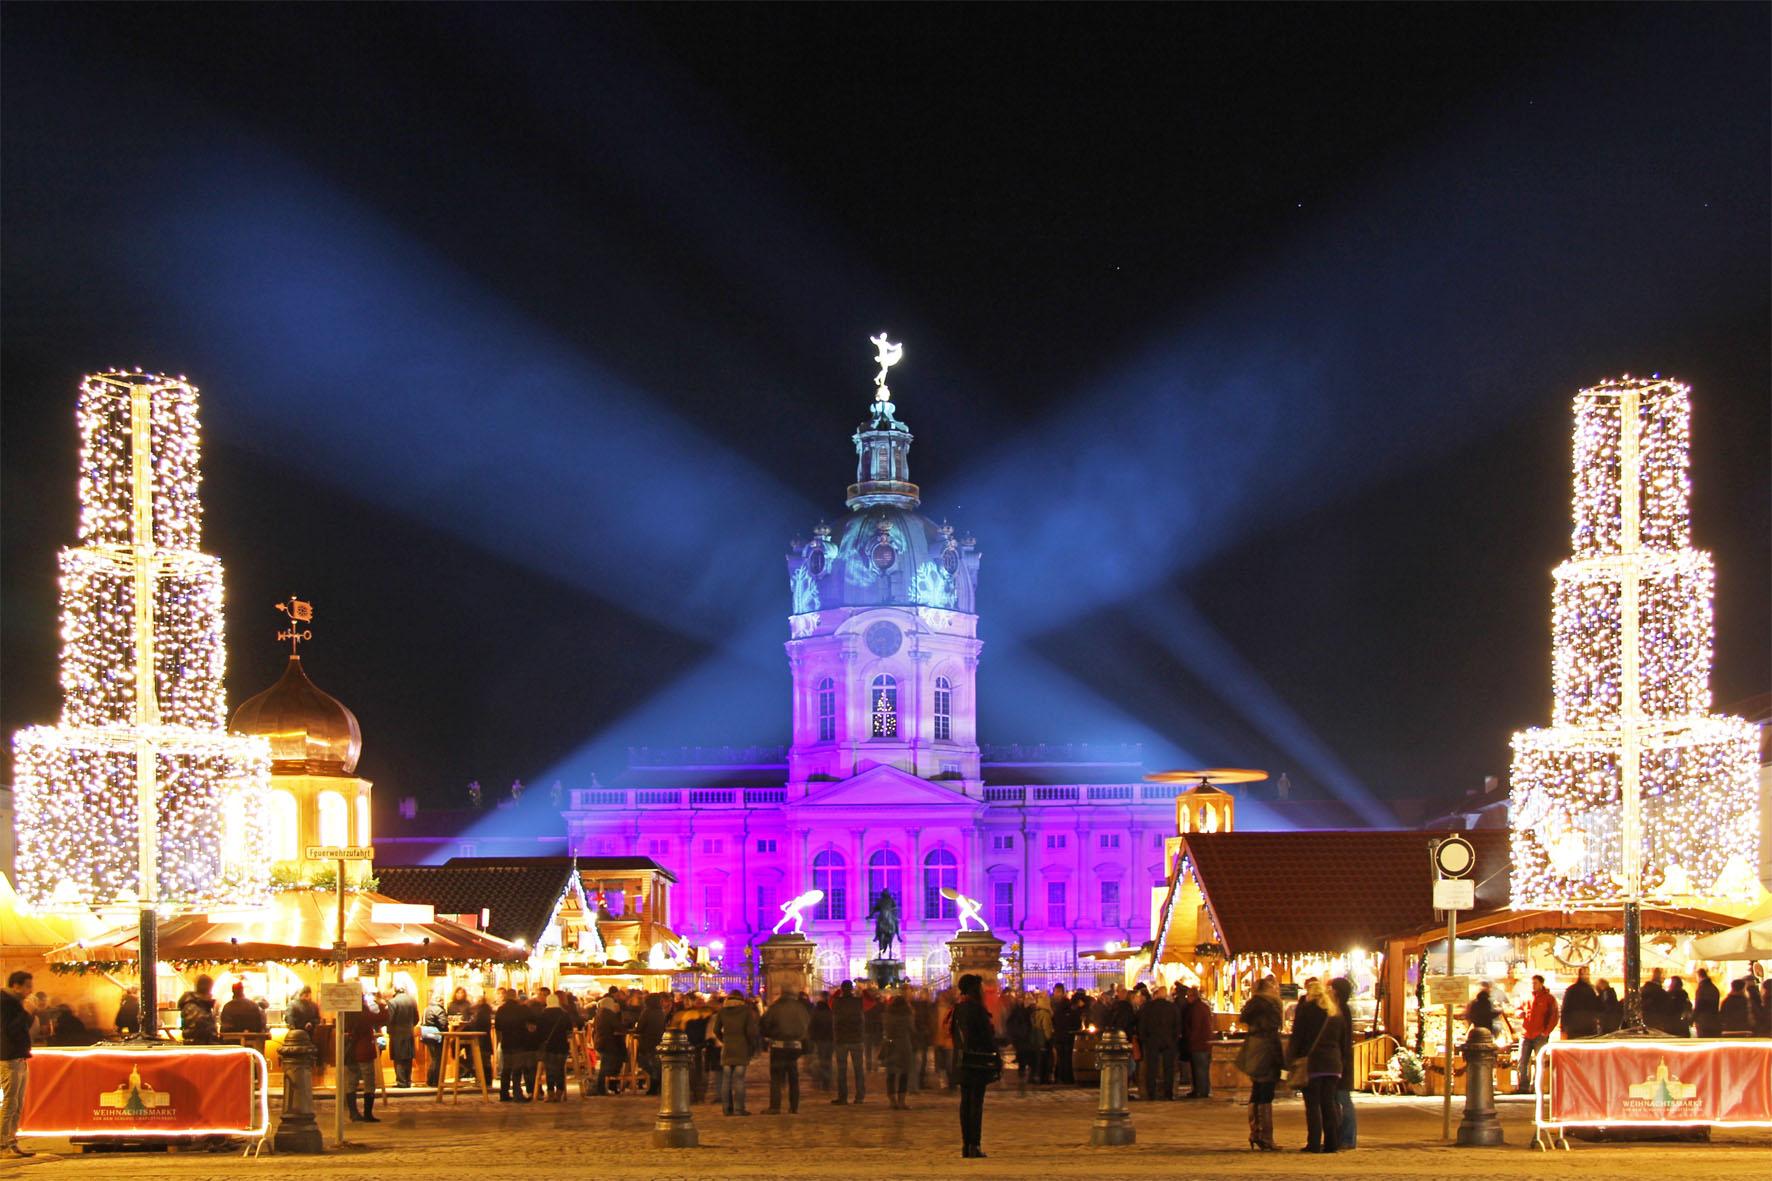 Charlotte Christmas Market.Berlin Christmas Markets 2015 6 Of The Best Berlin Love